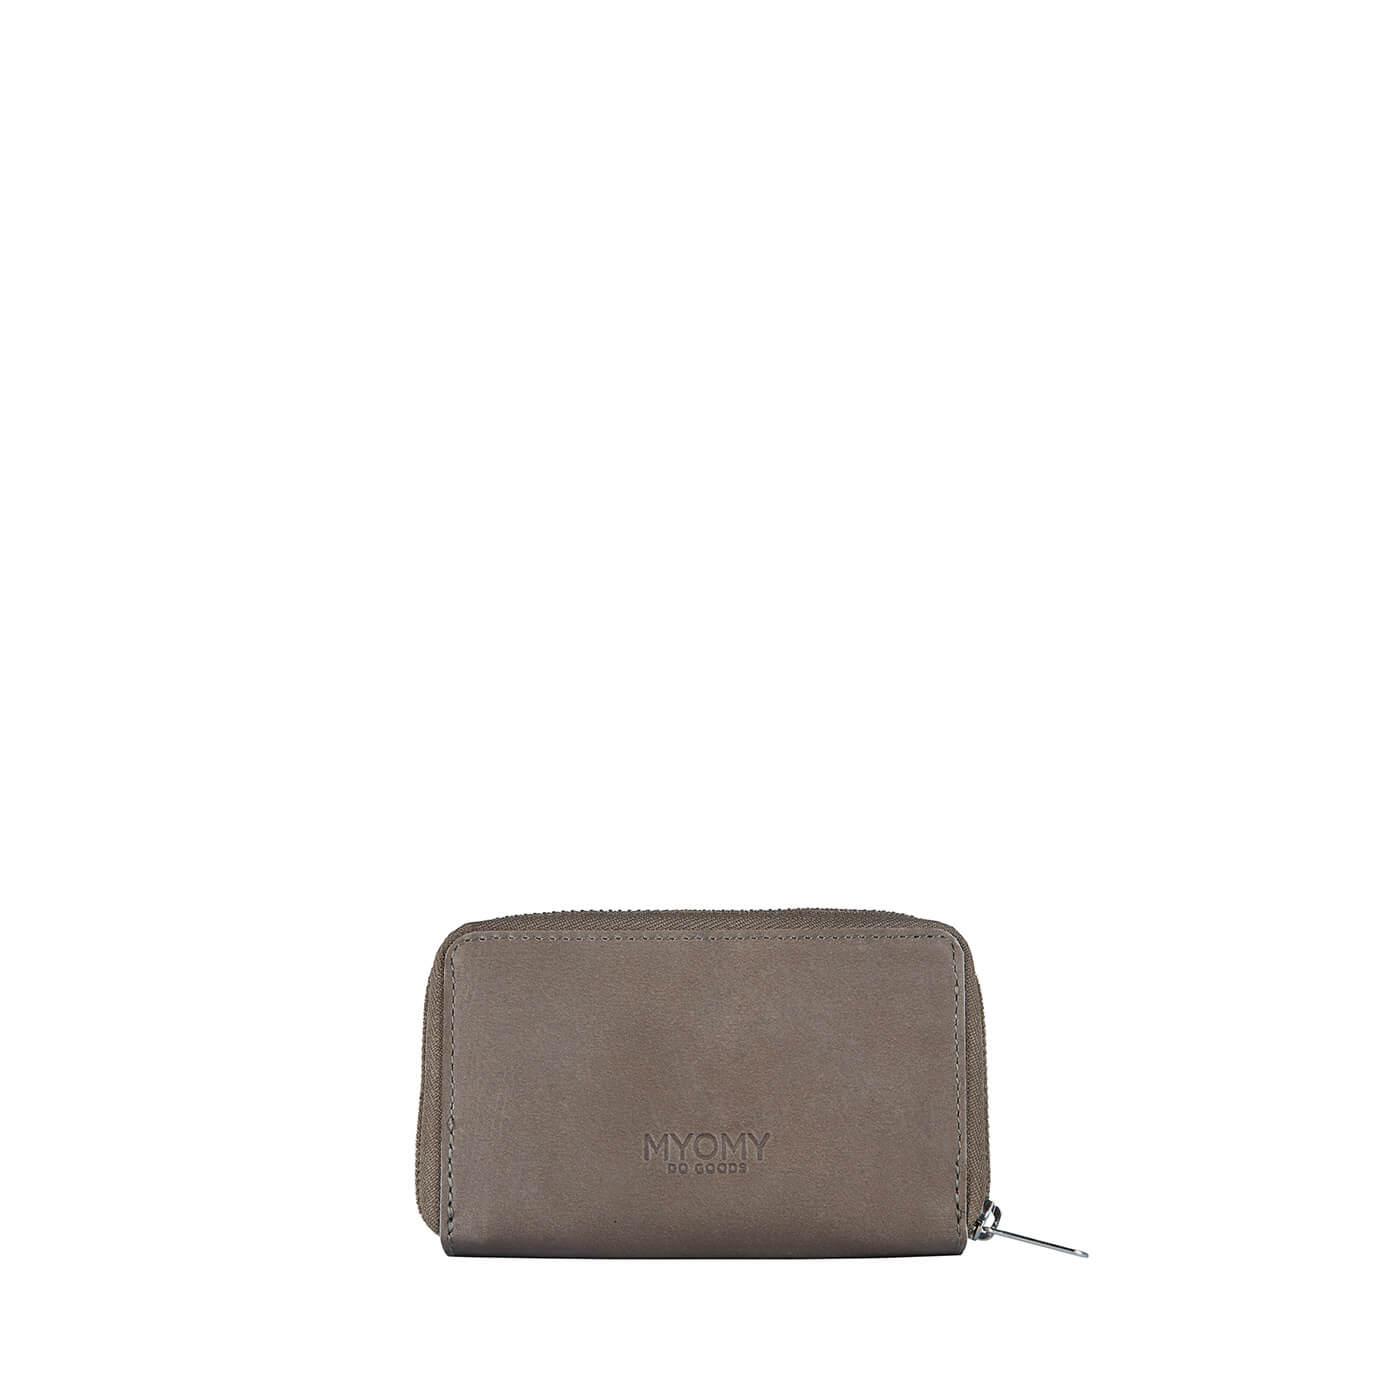 MY CARRY BAG Wallet Medium - hunter taupe